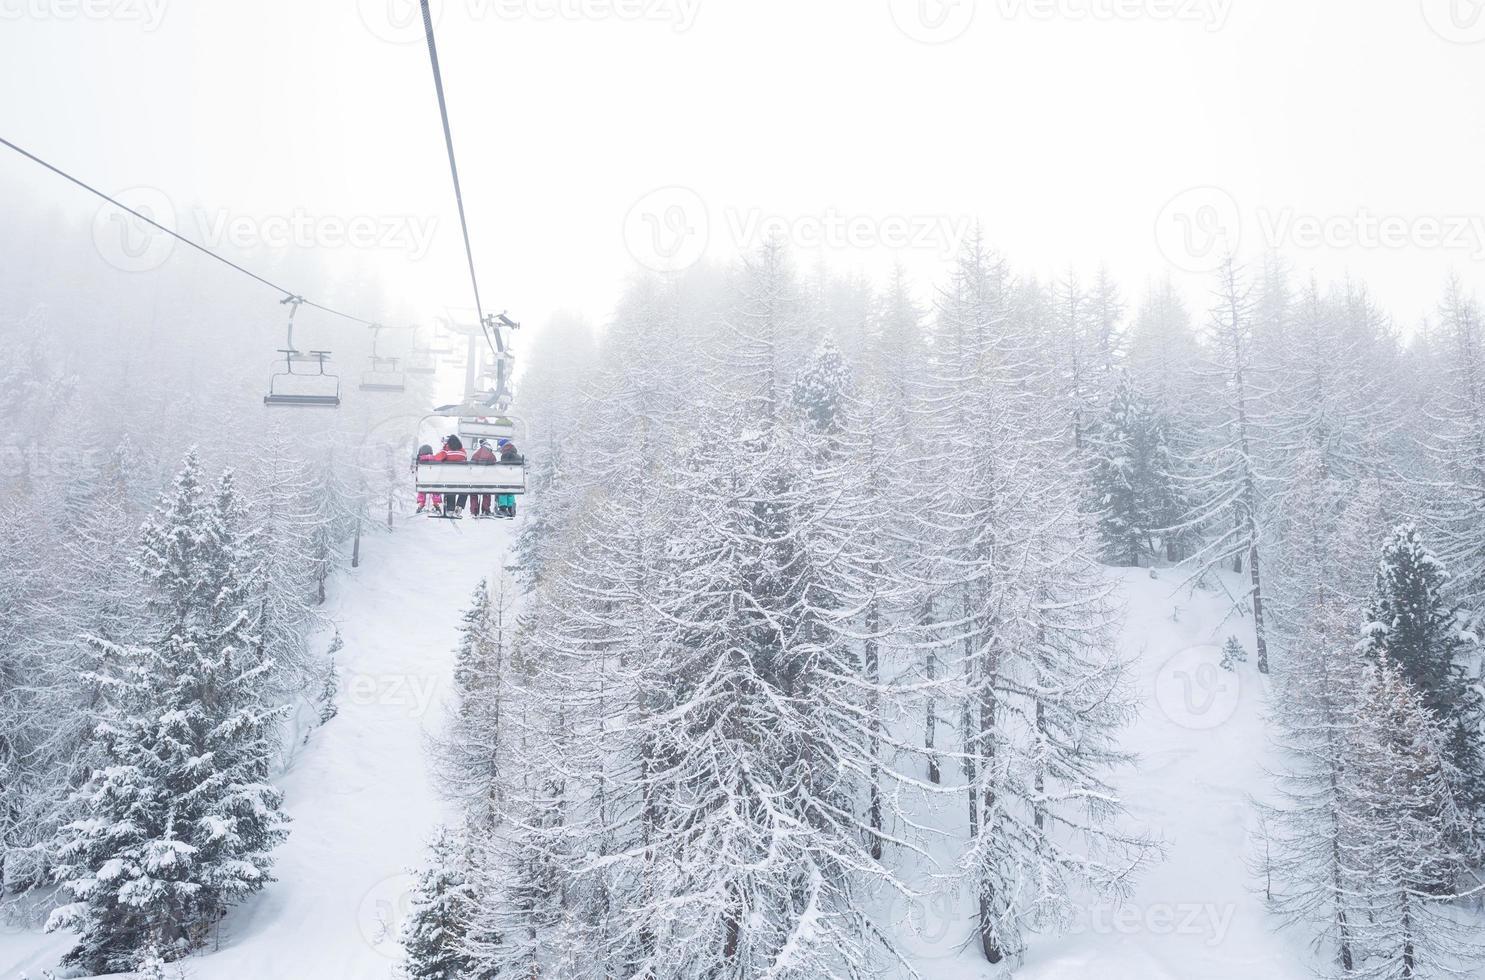 Ski lift with passengers in the gondola photo